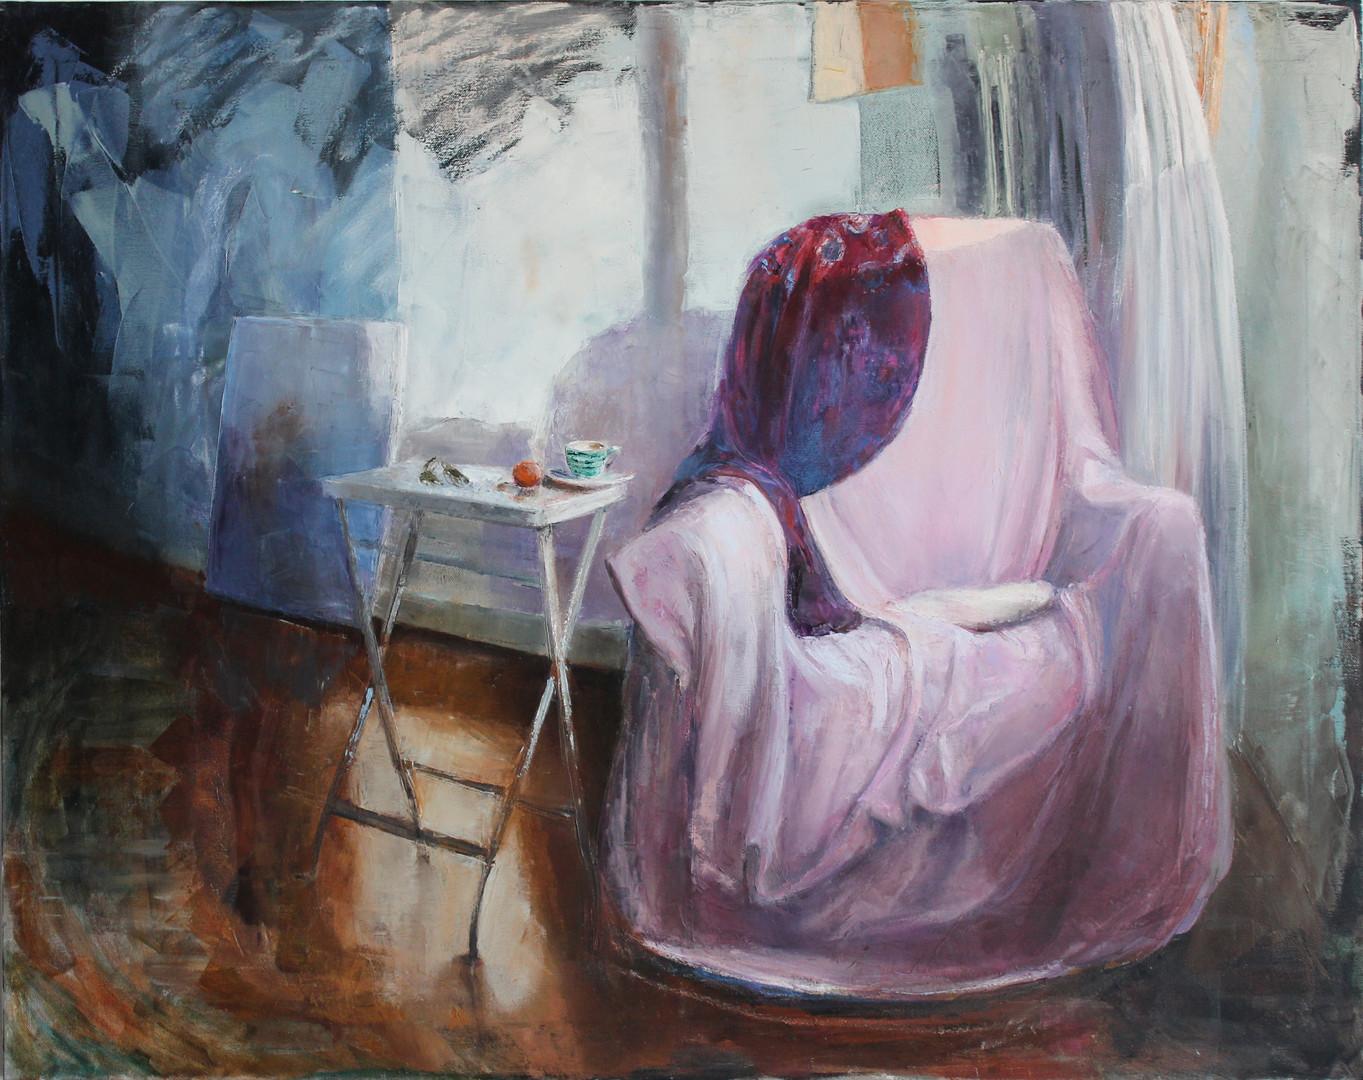 pinkchair.jpg